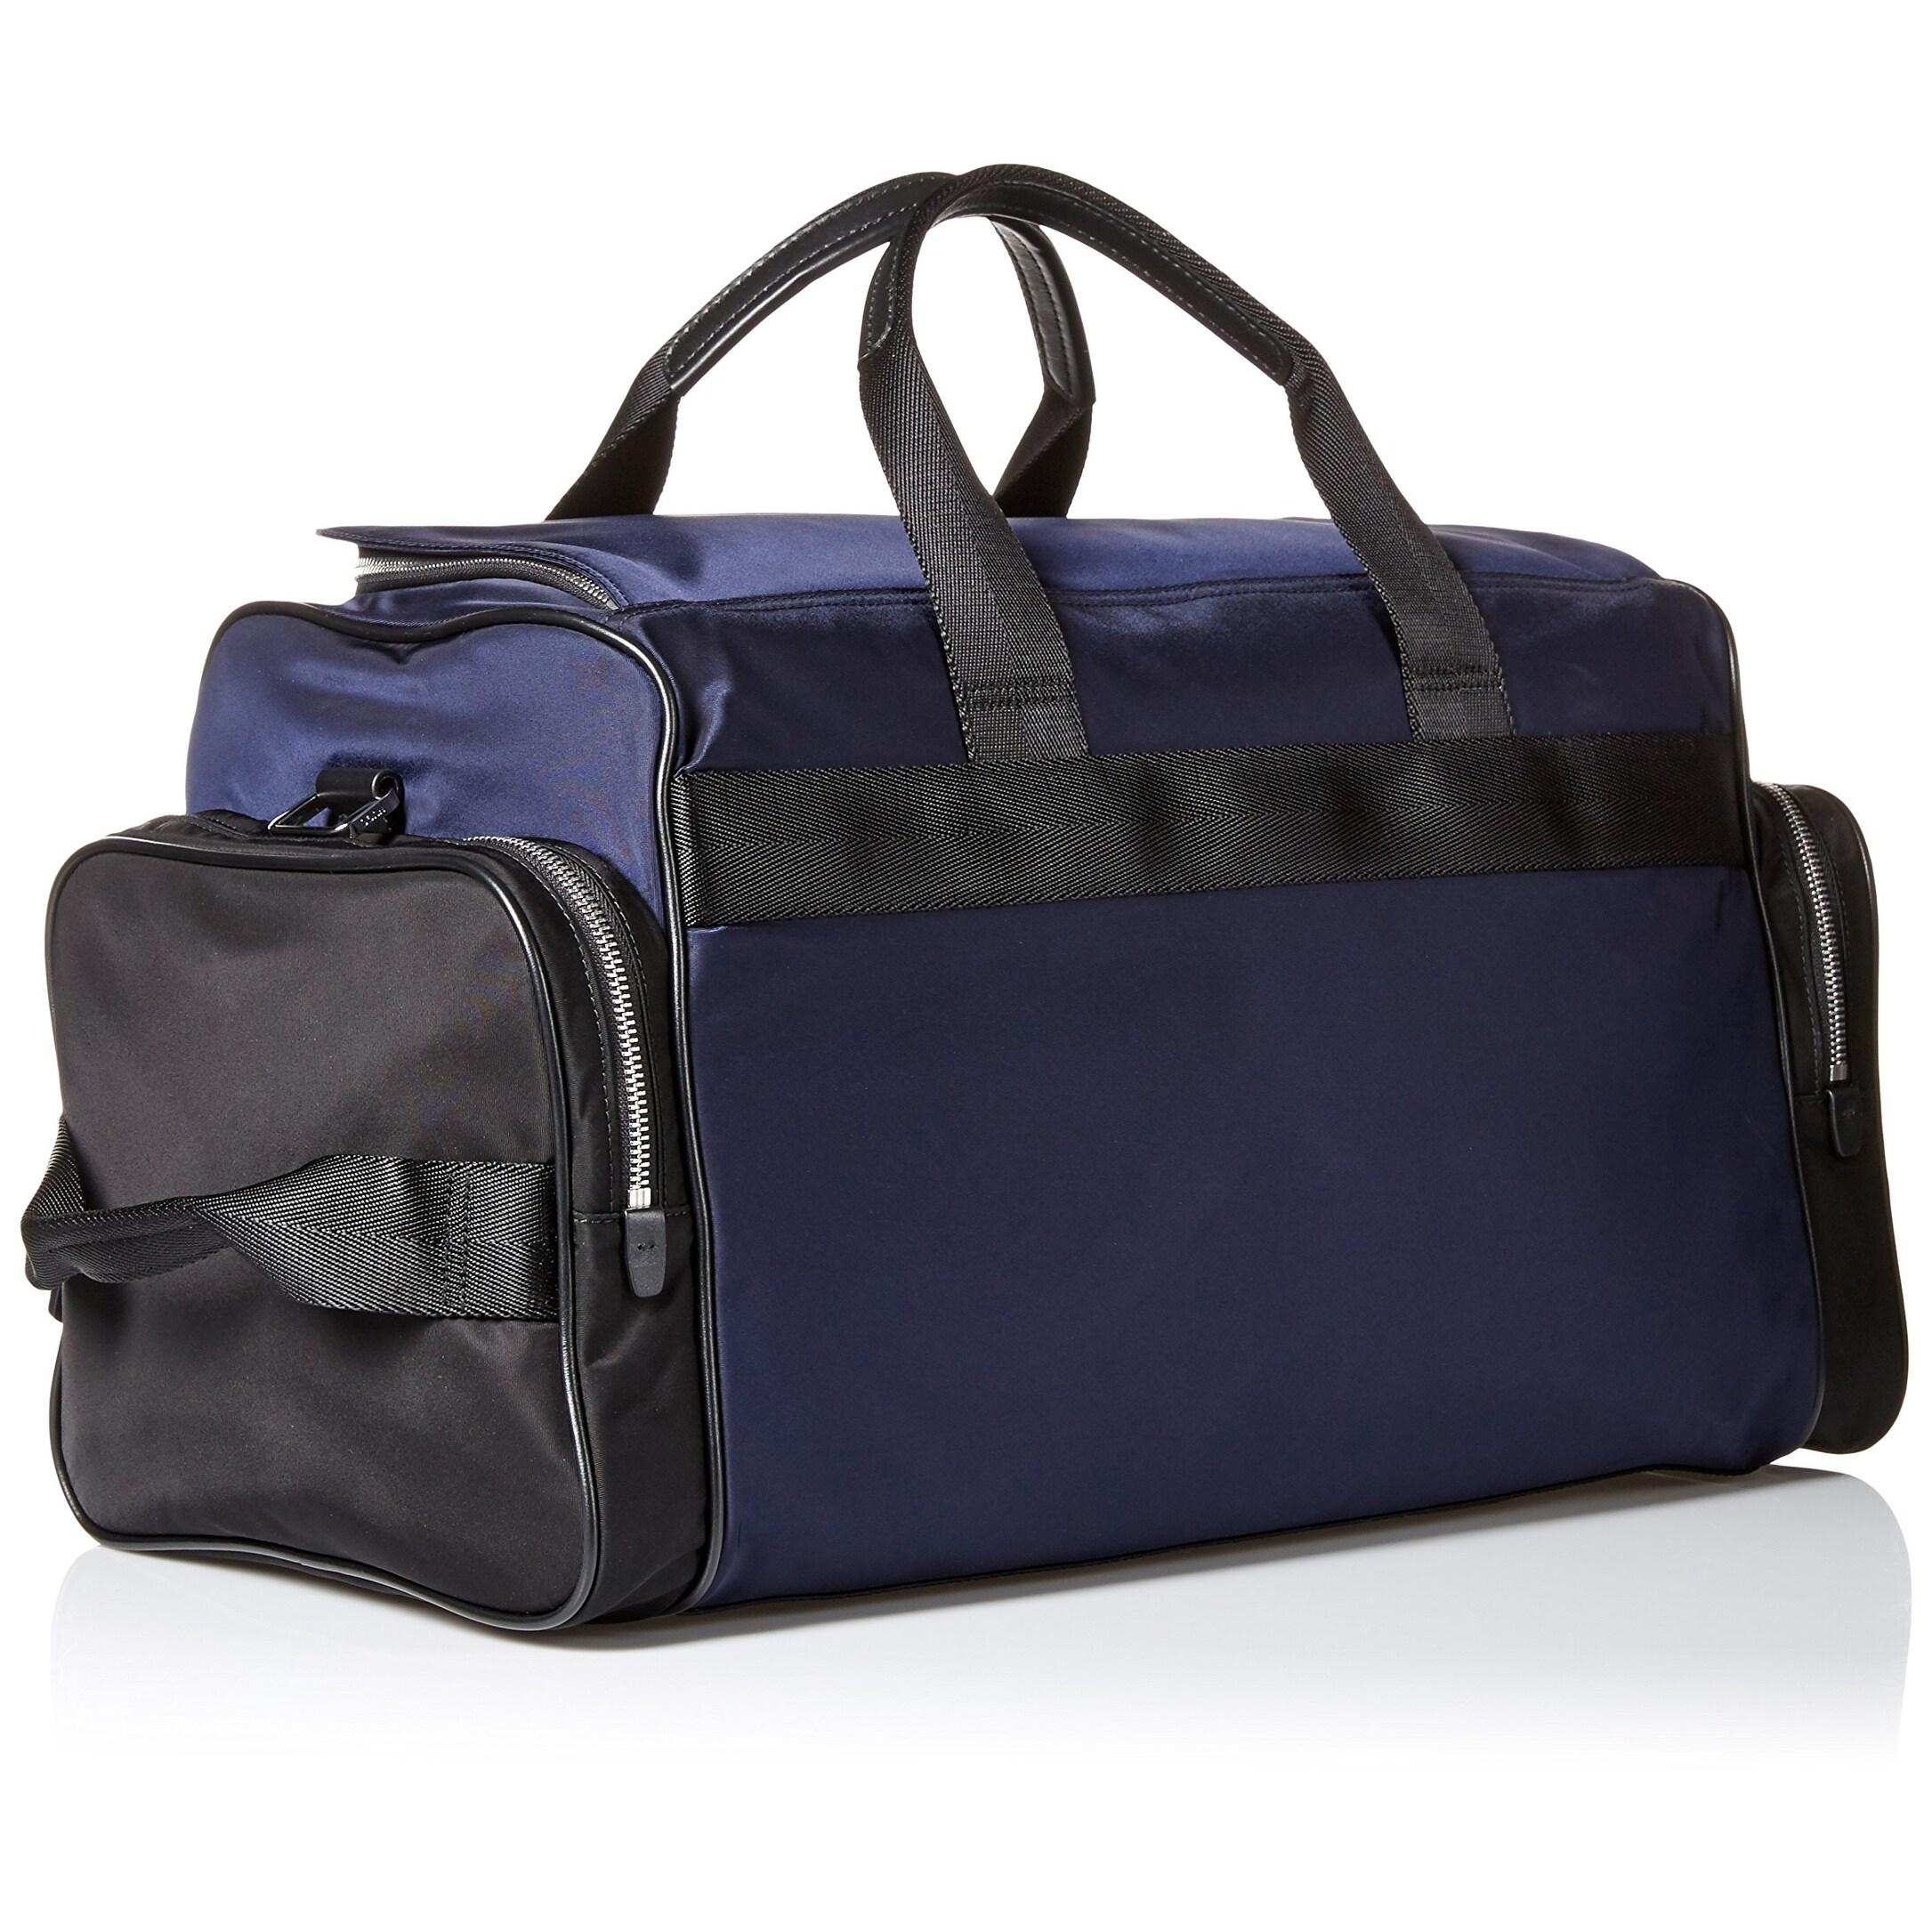 ... Black Grain Leather Traveller Bag for Men 50311778 with Top · Shop HUGO  BOSS NEW Blue Men s Duffle Bag Polyamide Nylon Double Zipper - Free  Shipping ... 90b15eabcb